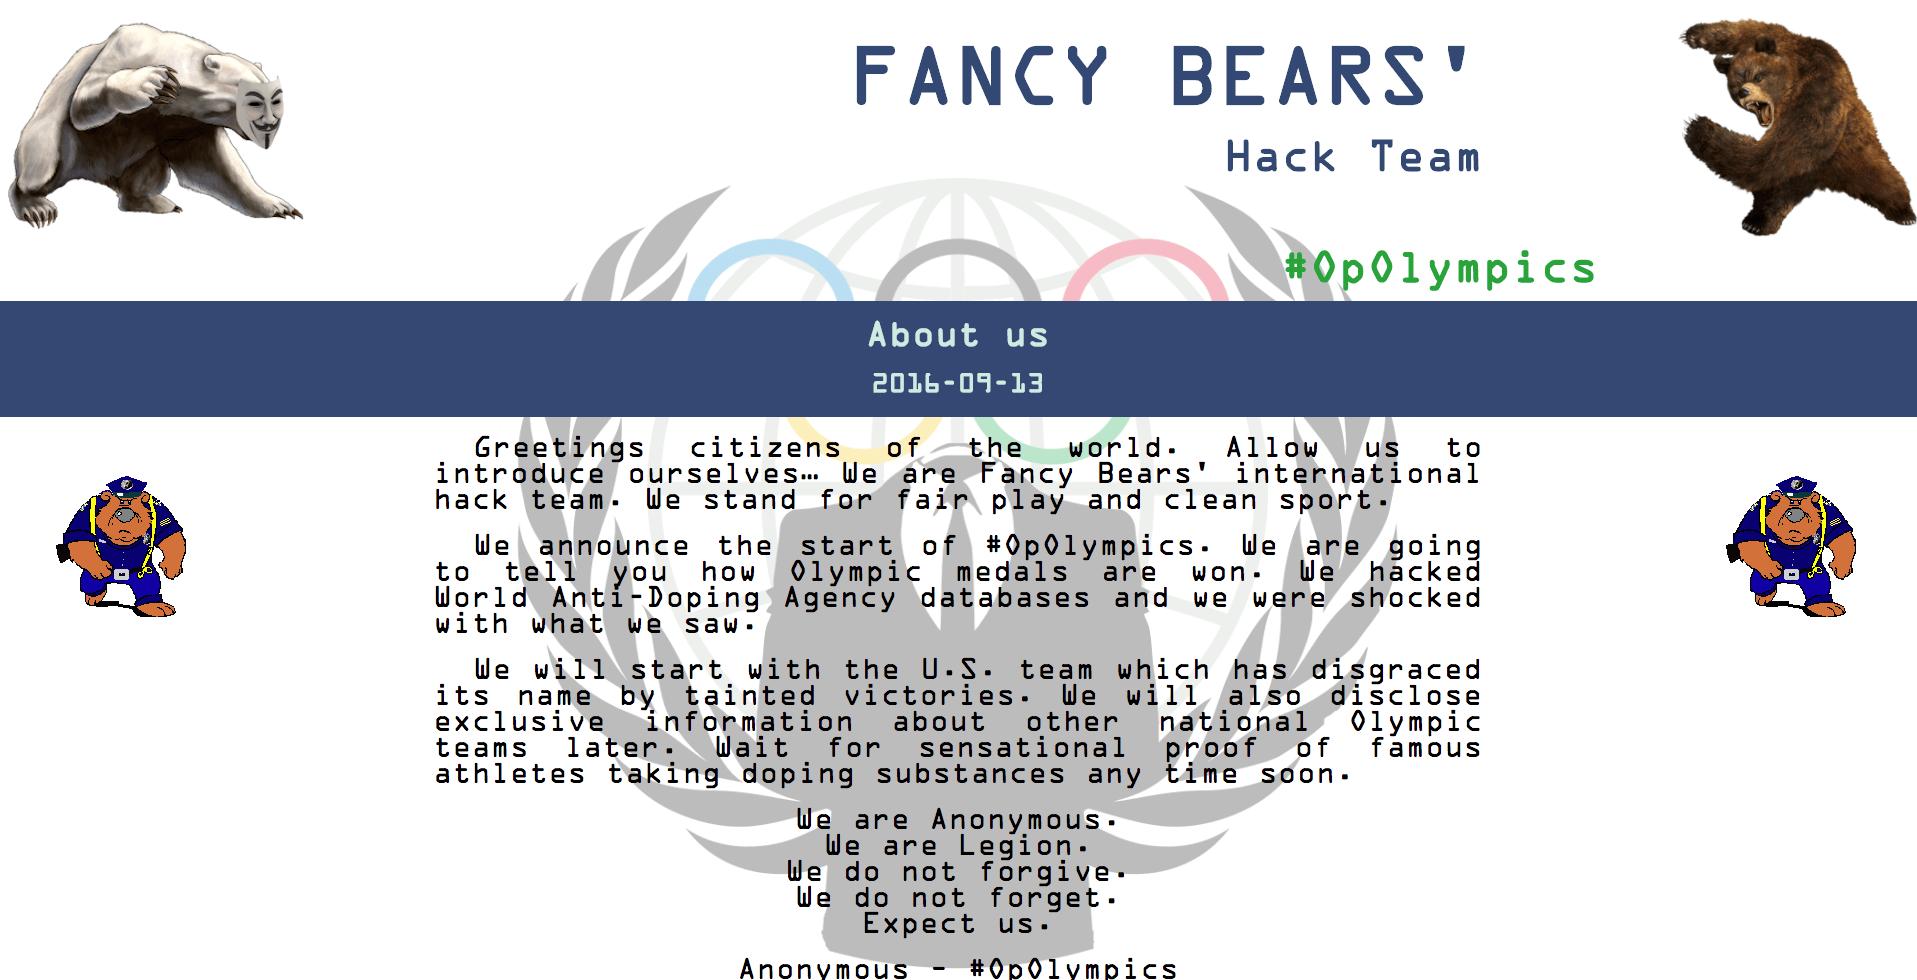 Figure 5. Fancy Bears' Hack Team website. (Source: SecureWorks)